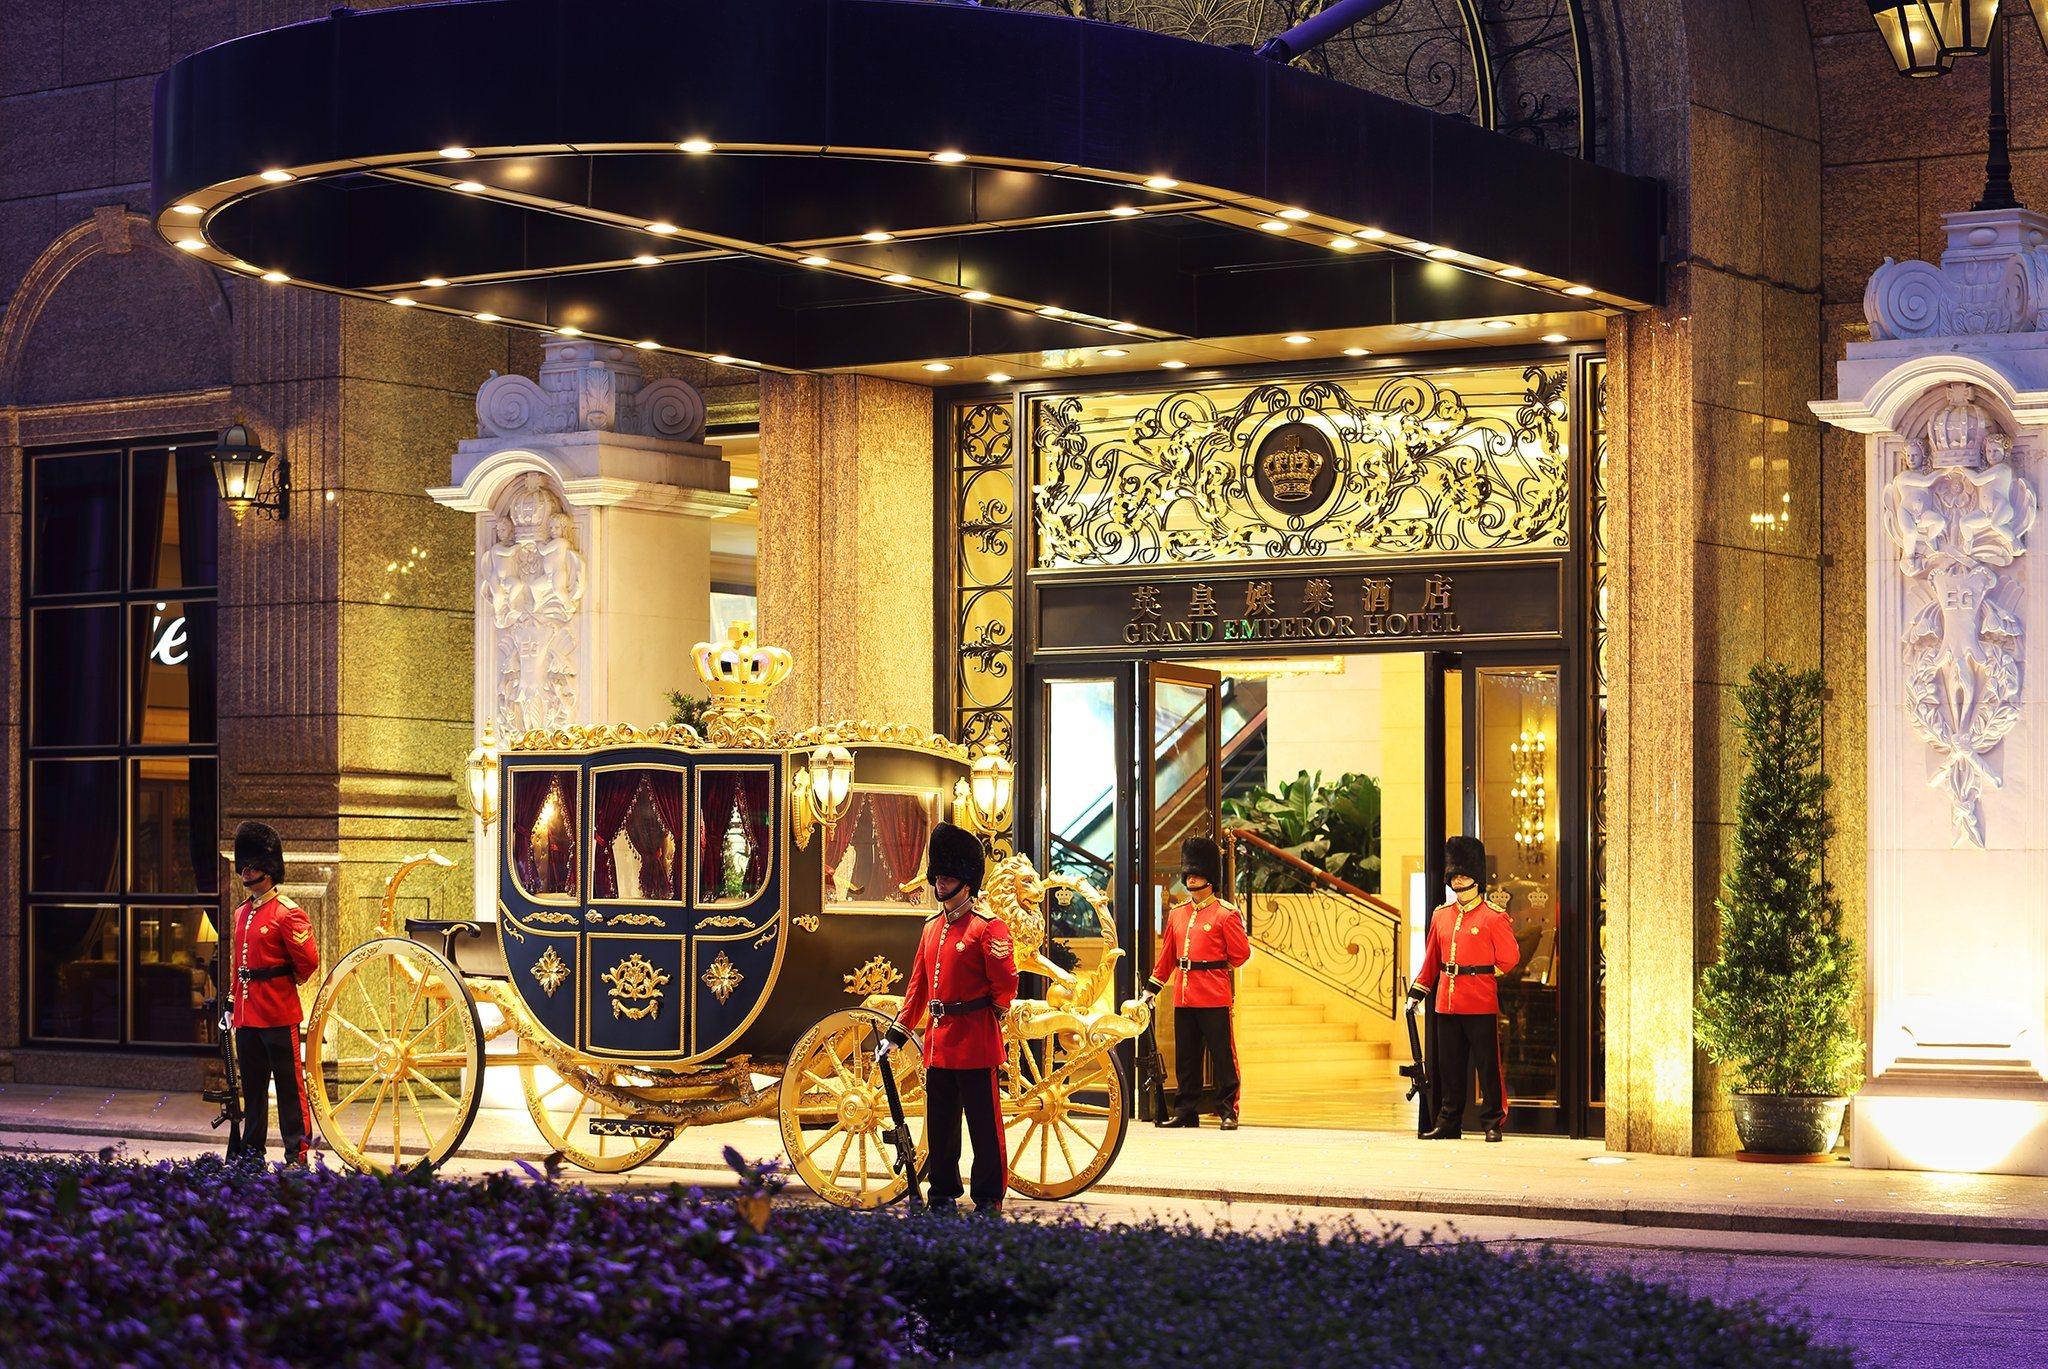 Macau casinos hotel rooms gambling